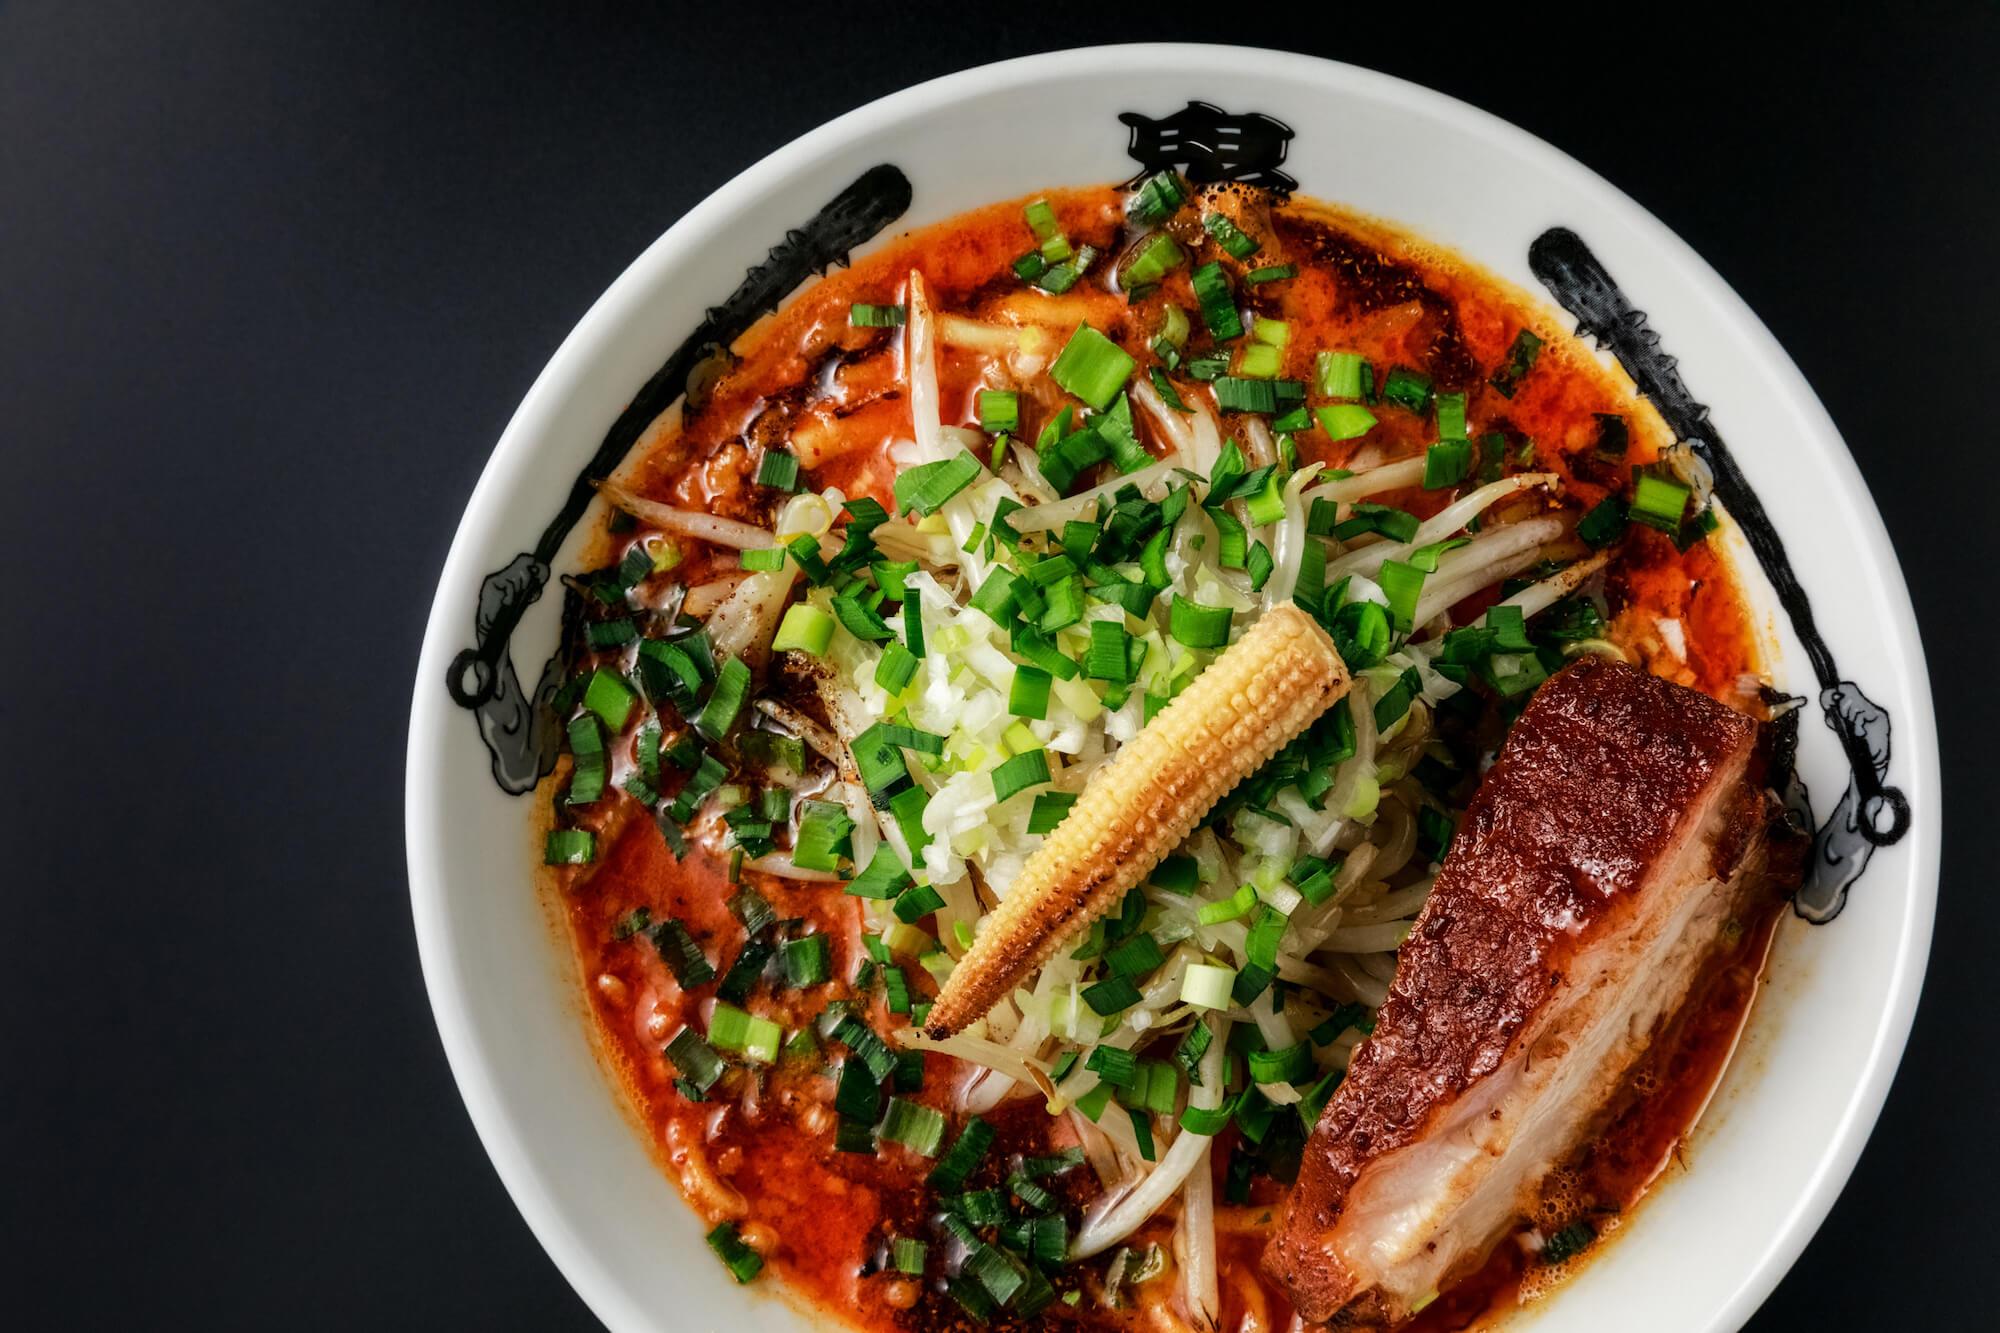 Kikanbo: the concept is ramen to delight all five senses